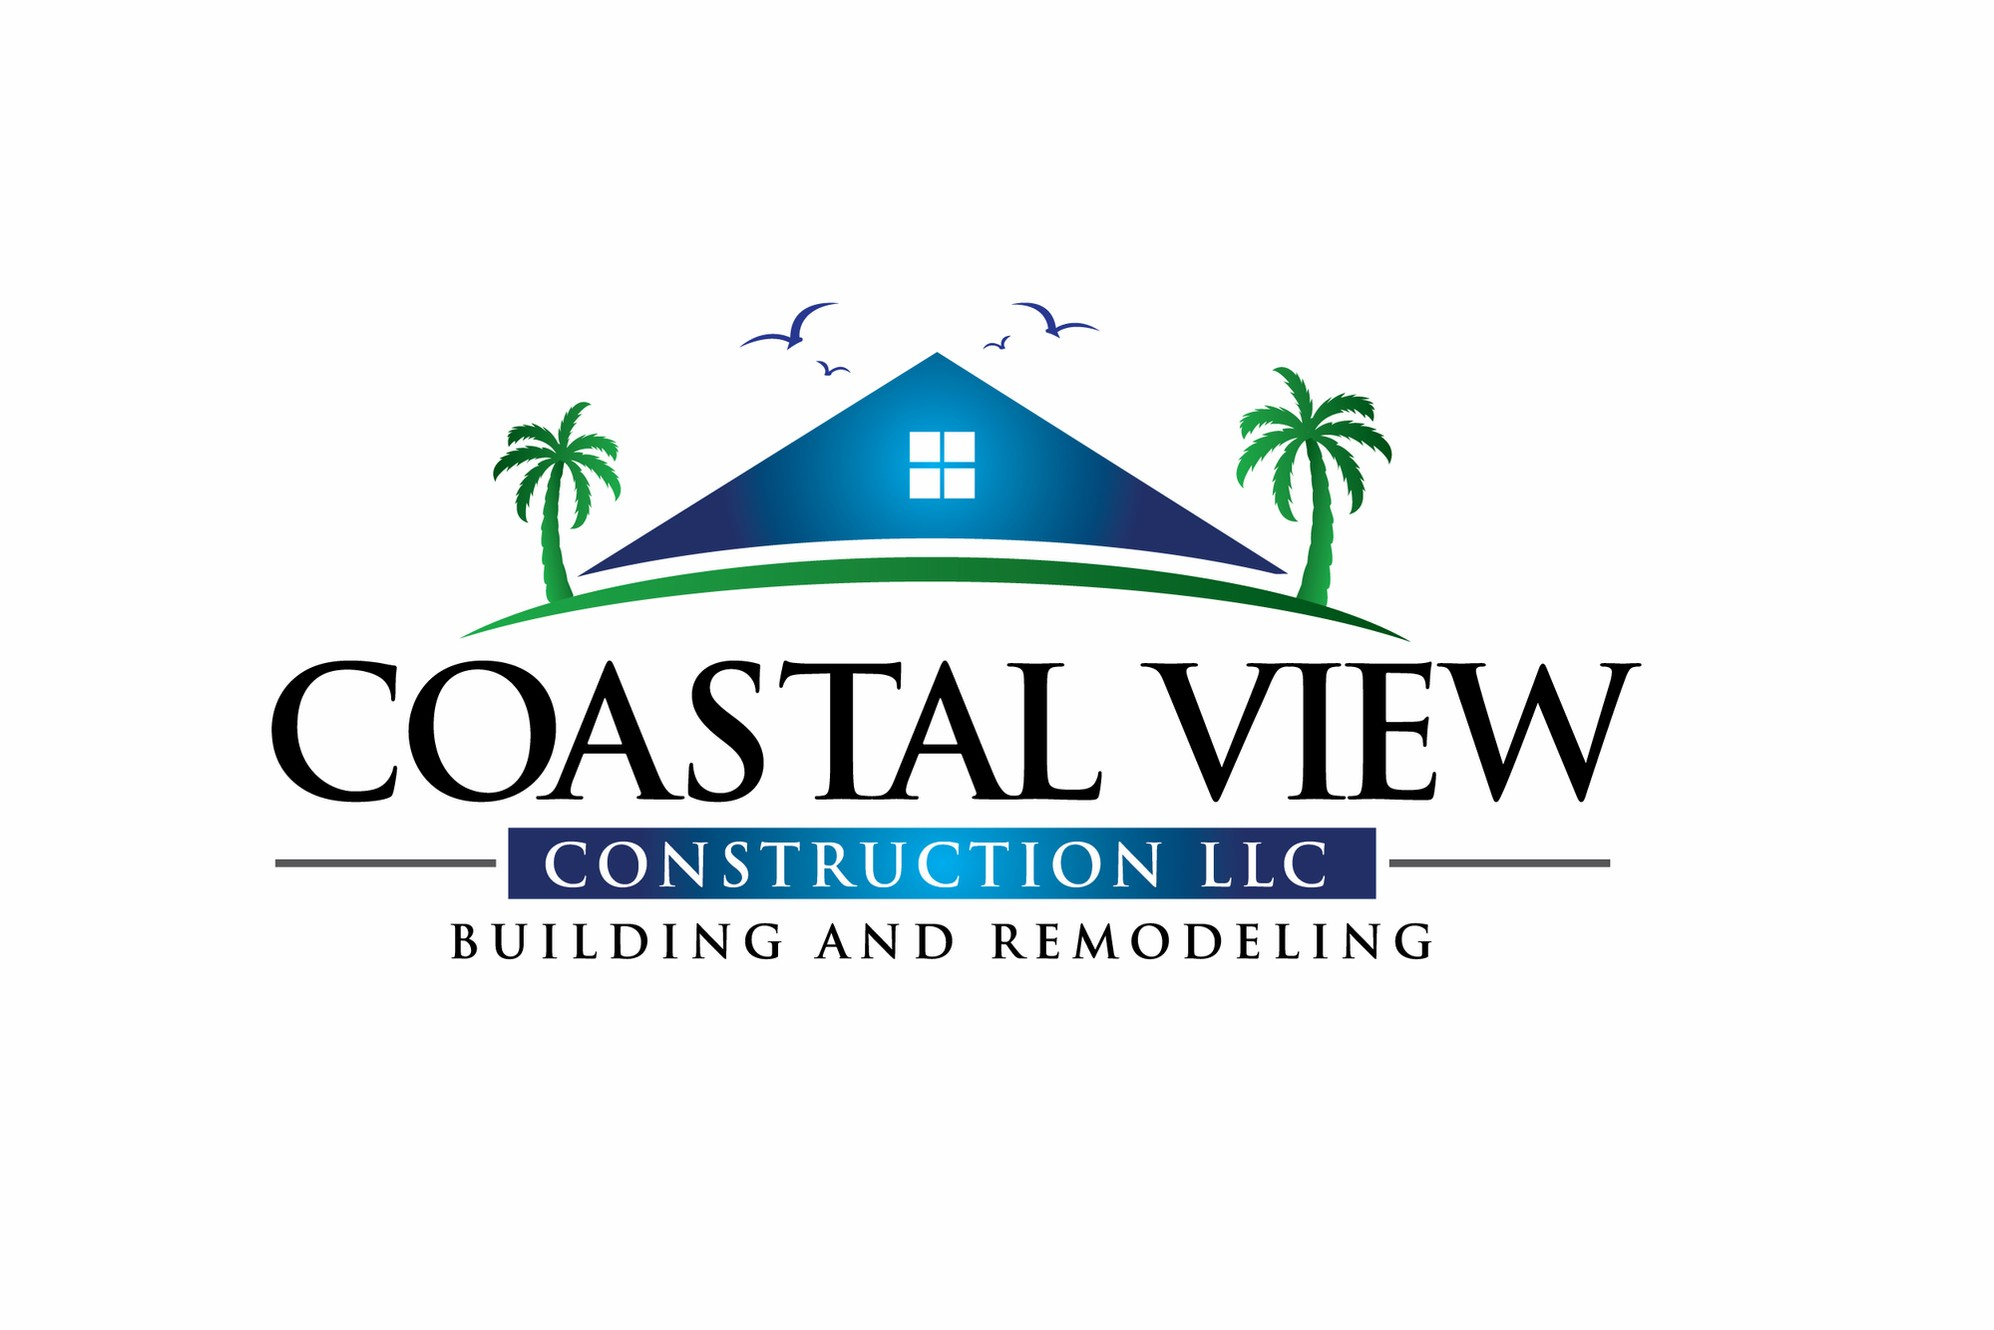 Coastal View Construction LLC logo